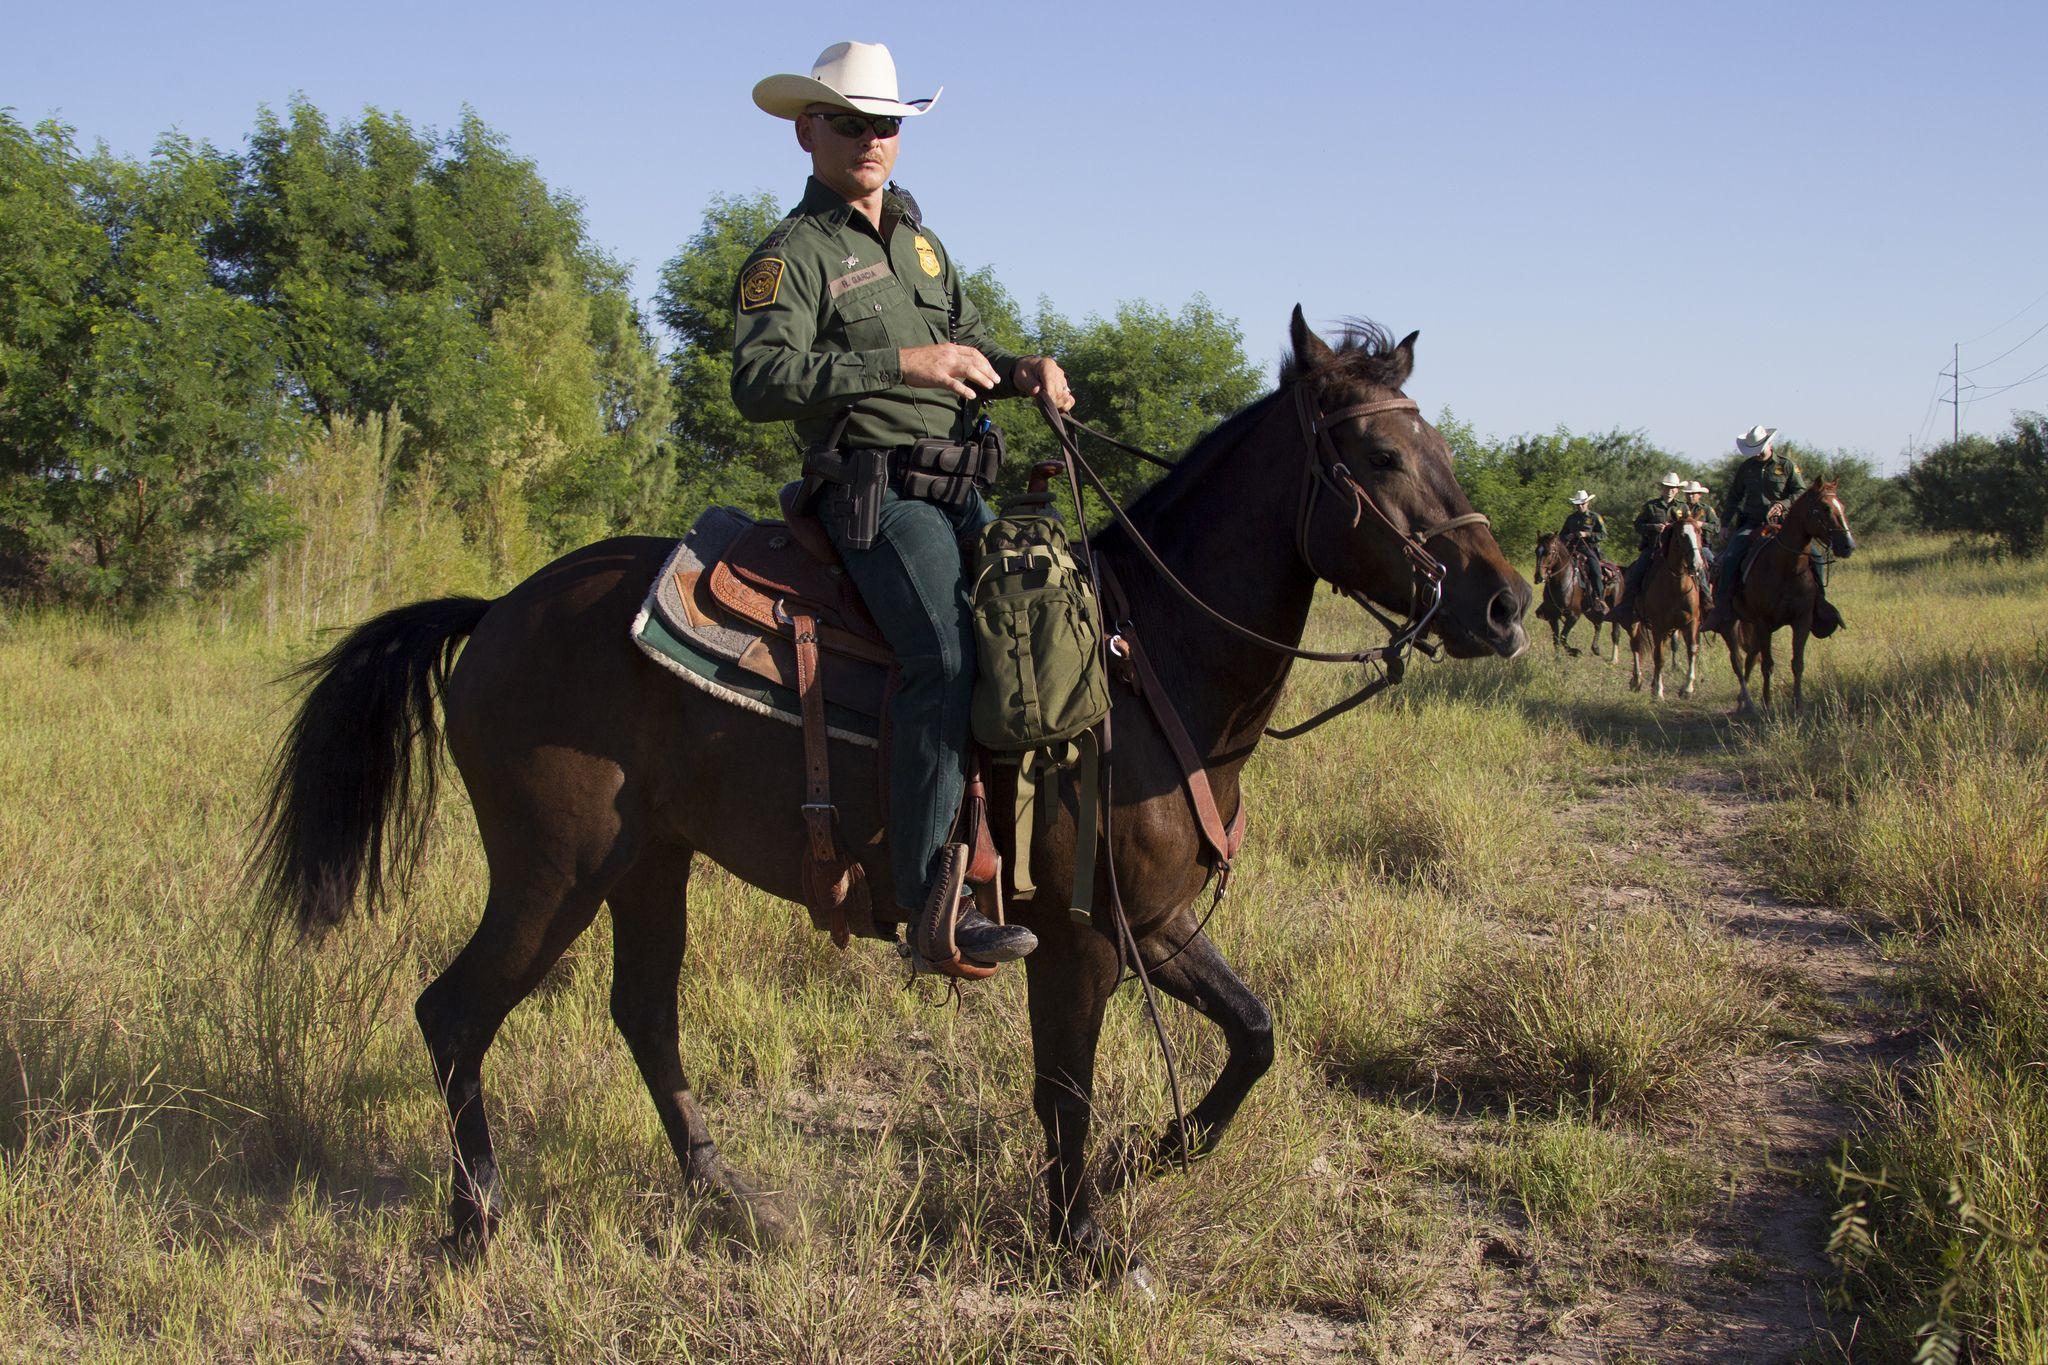 south texas  border patrol agents  mcallen horse patrol unit